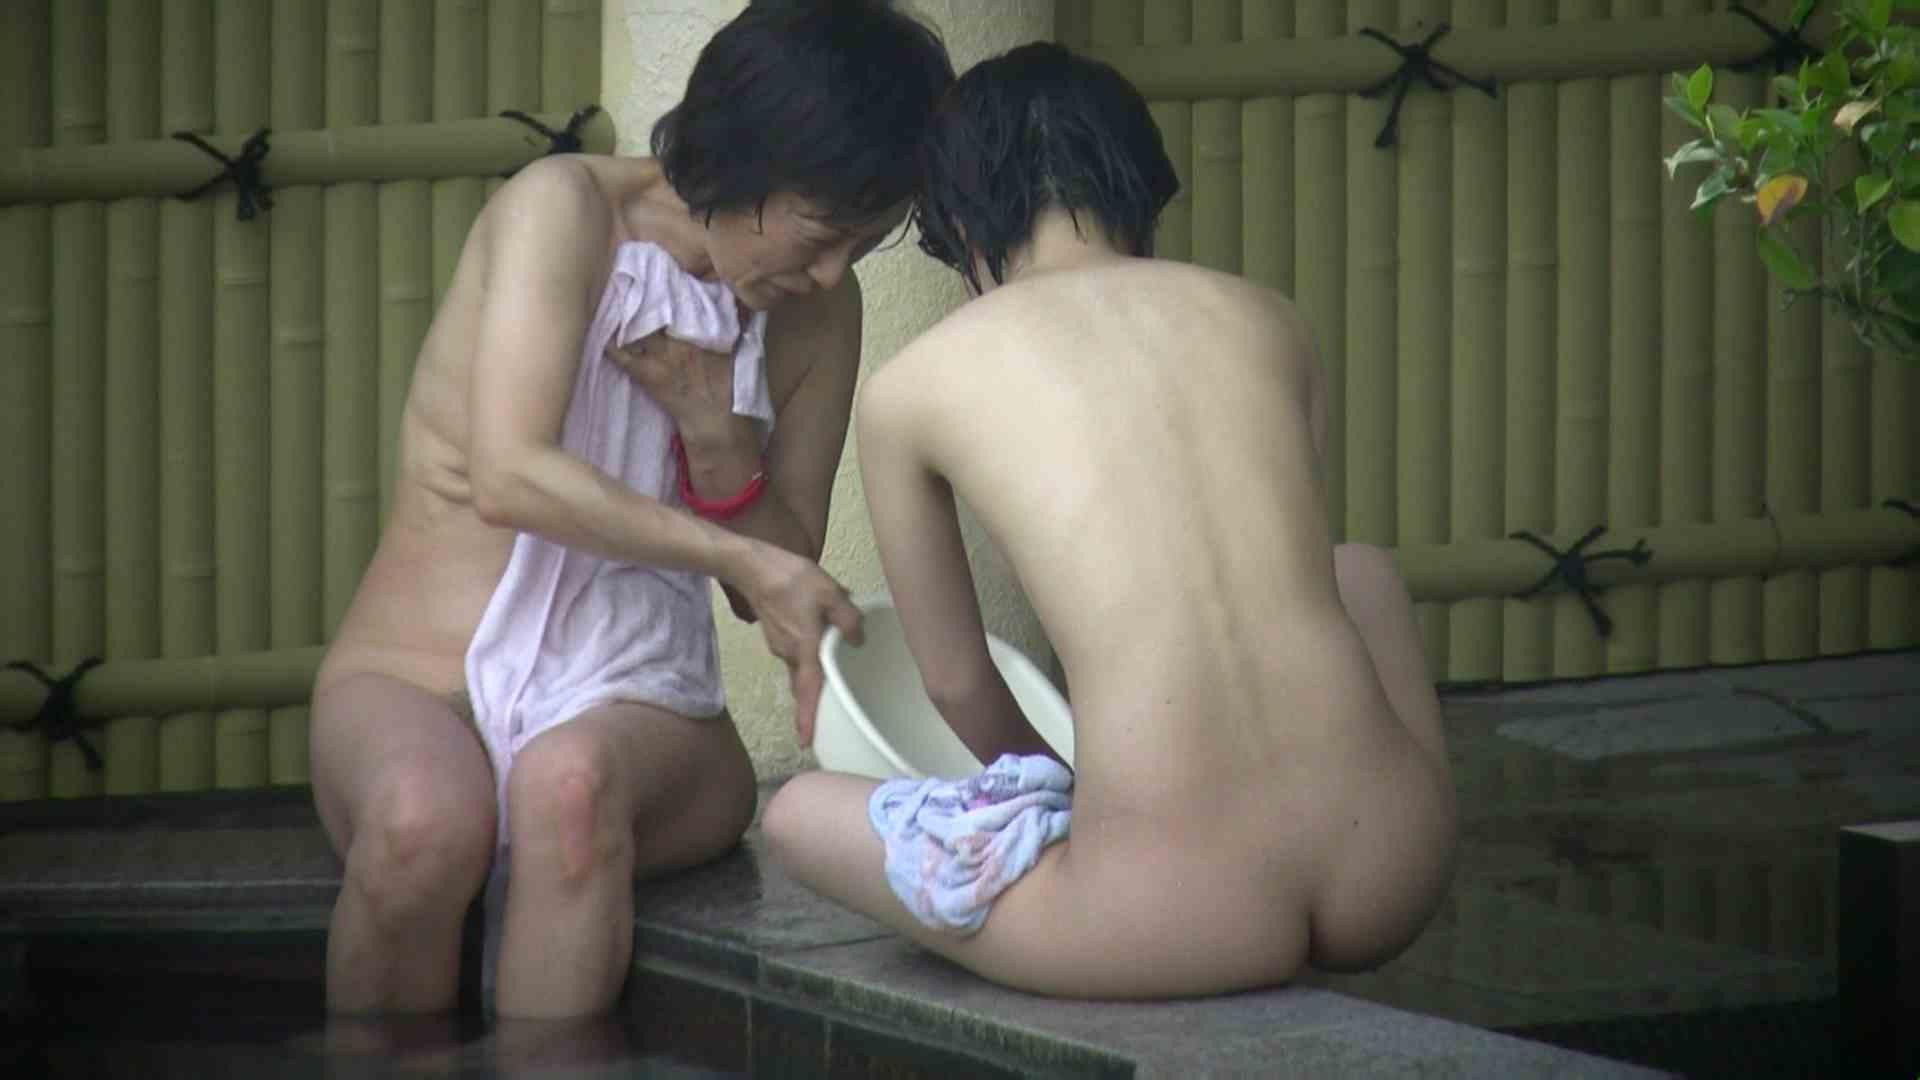 Aquaな露天風呂Vol.06【VIP】 盗撮大放出 ヌード画像 96連発 8